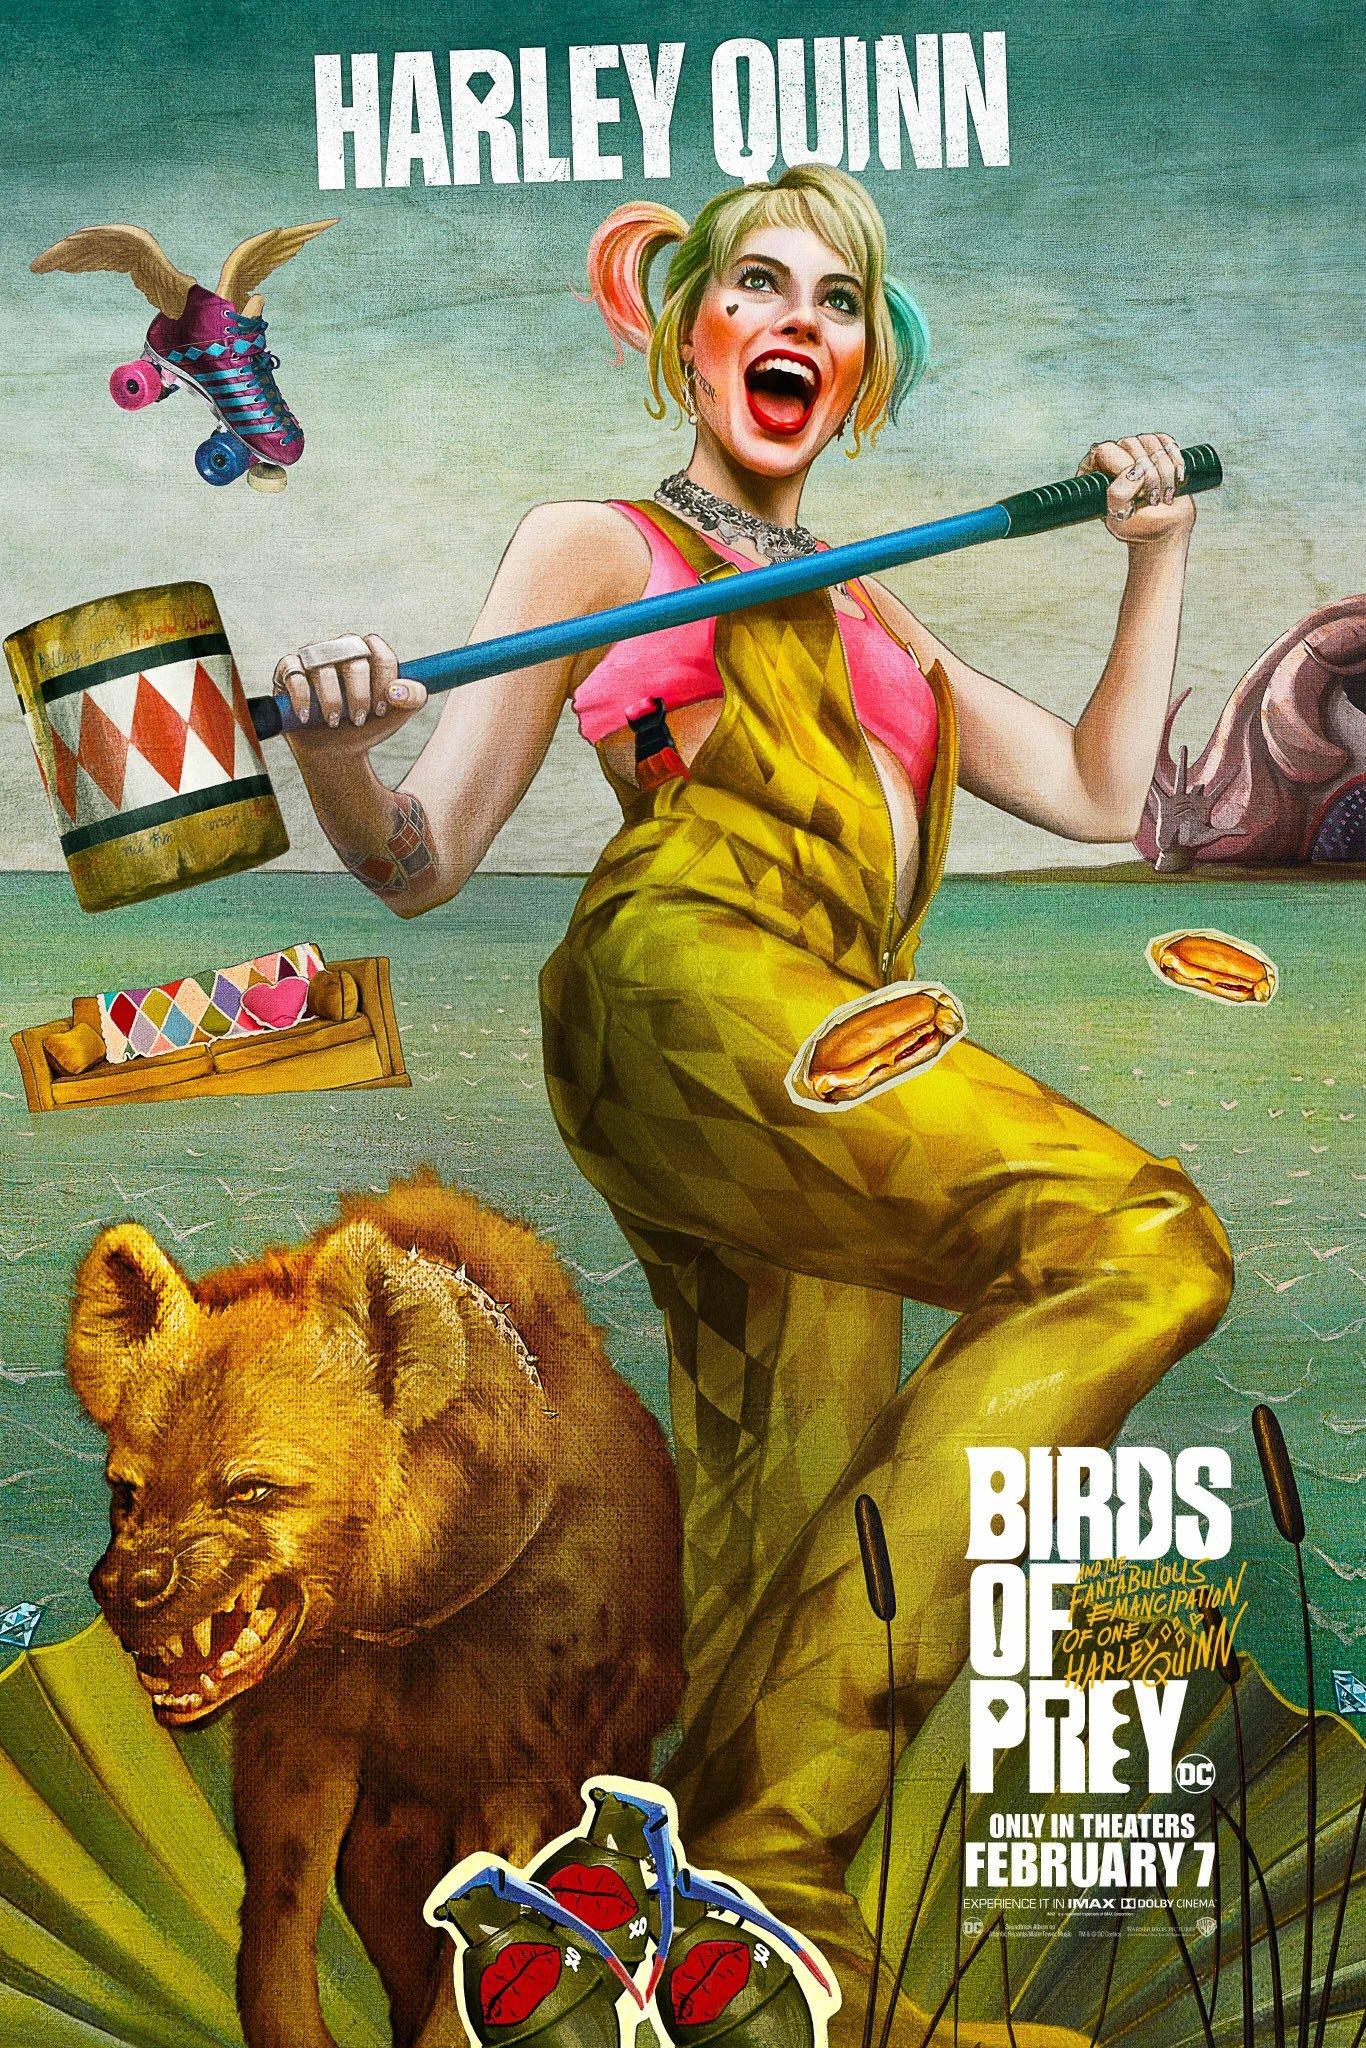 szmk_birds_of_prey_ragadozo_madarak_harley_quinn_csodasztikus_felszabadulasa_dc_batman_gotham_joker_baseball_bruce_12.jpg